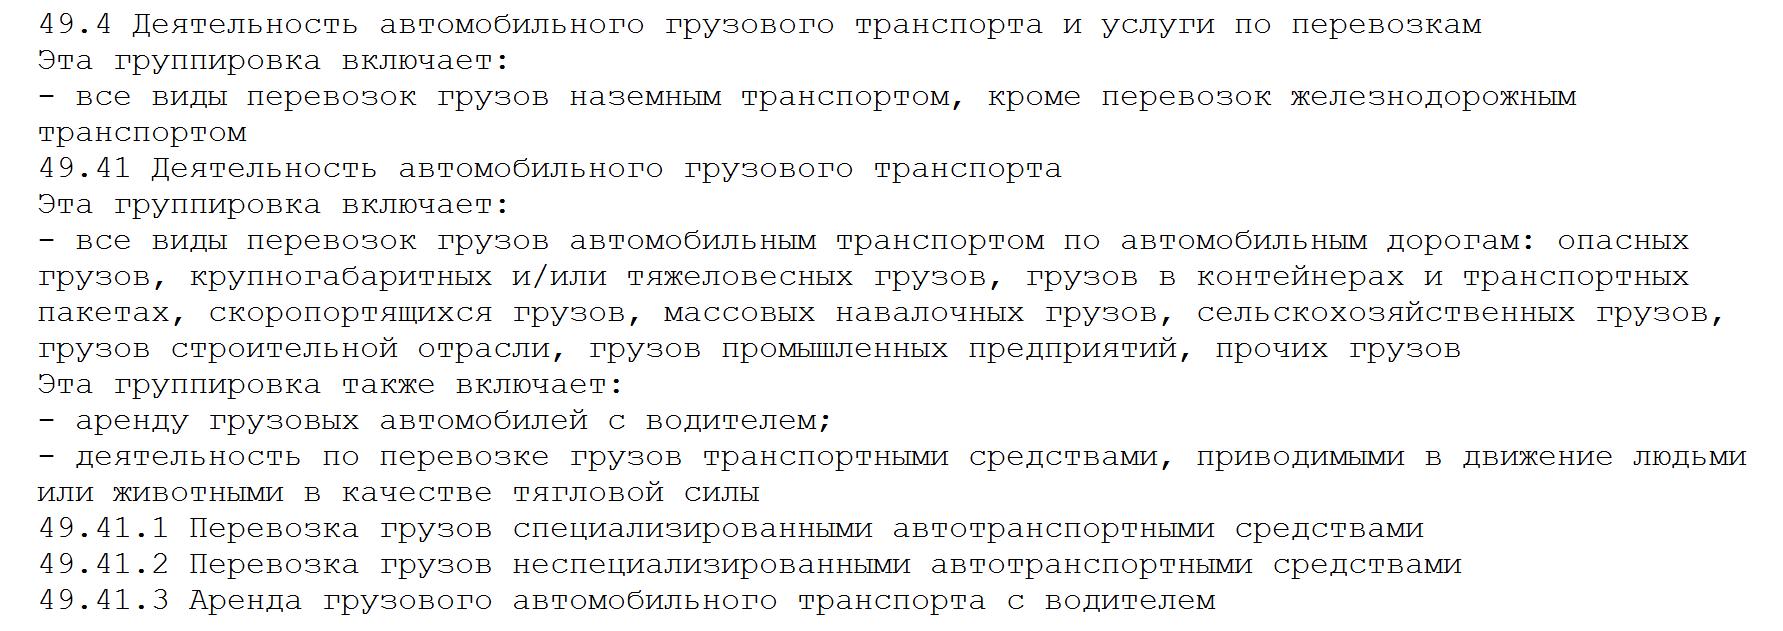 ОКВЭД 49.41 расшифровка